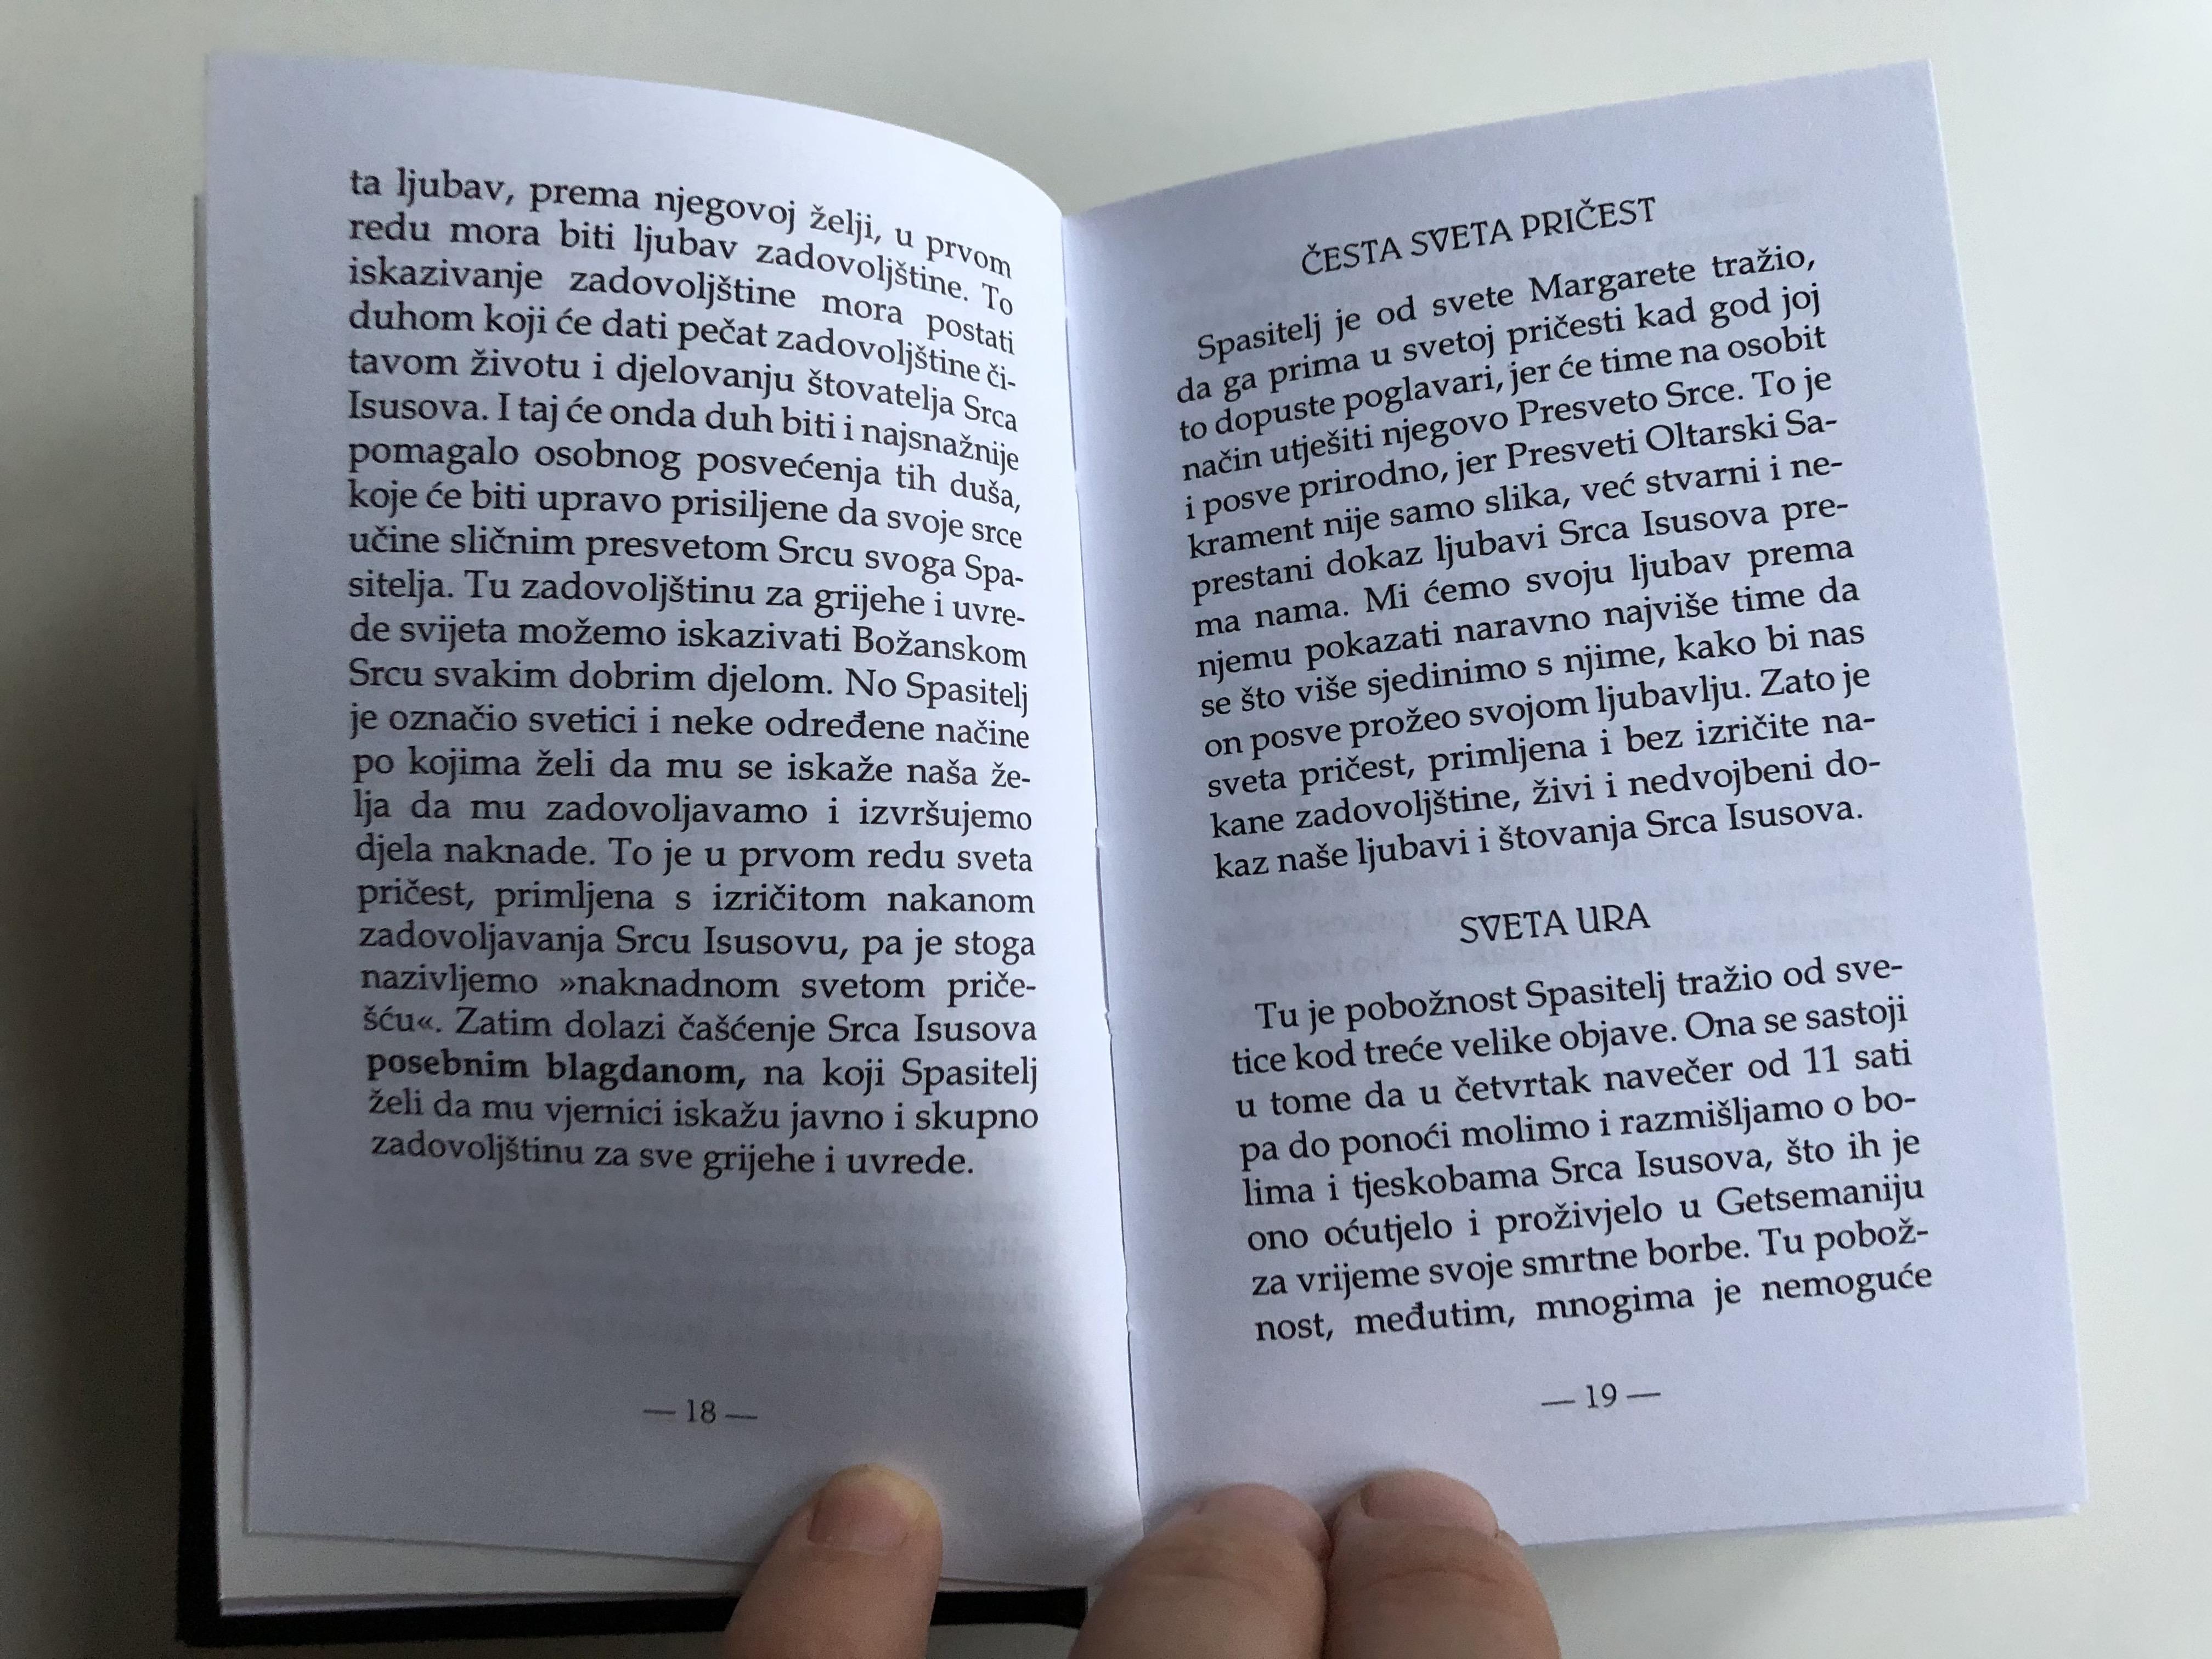 srce-isusovo-spasenje-na-e-croatian-language-prayer-book-6.jpg